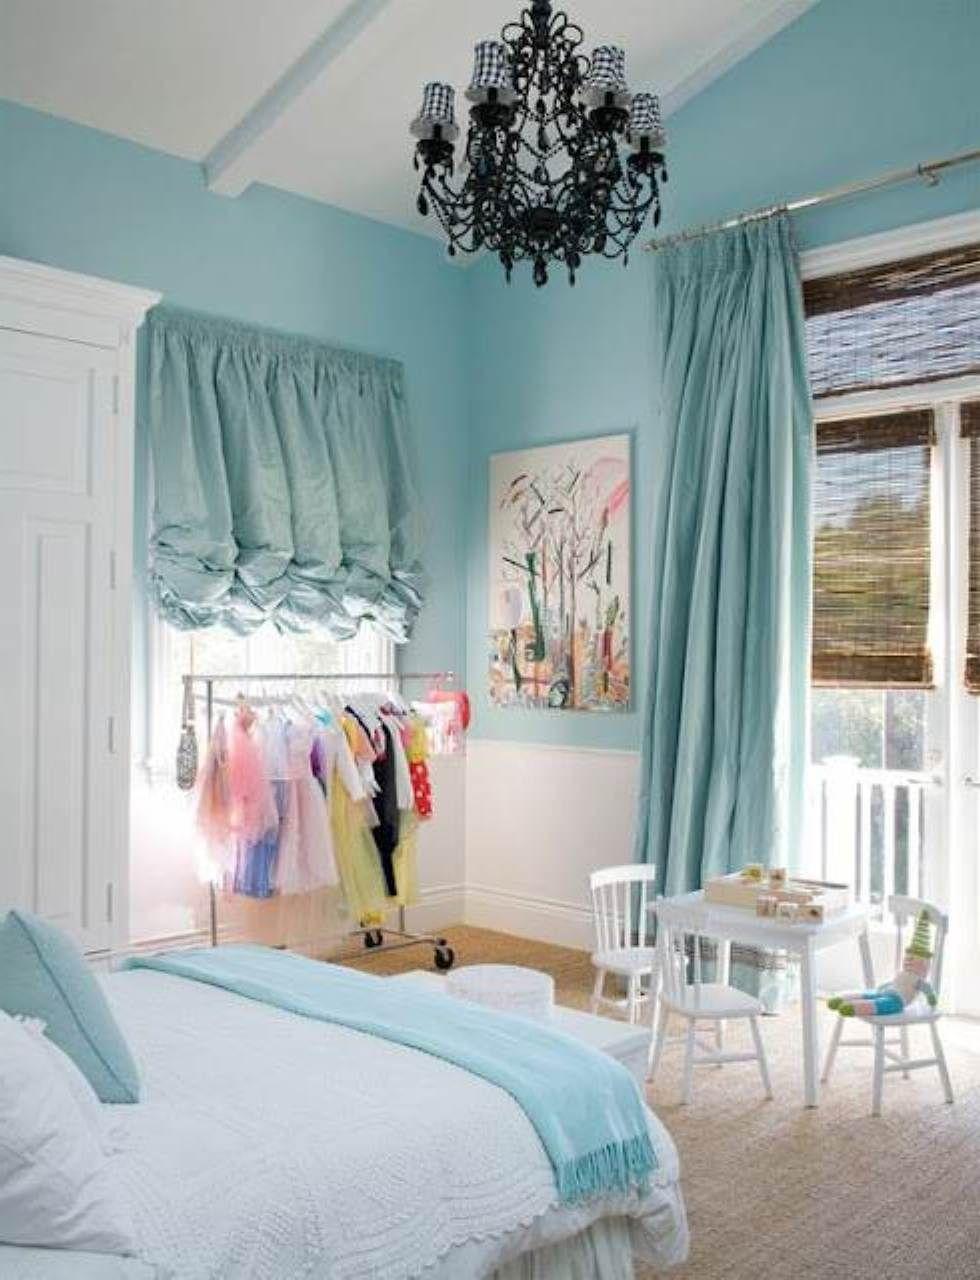 Bedroom Designs For Little Girls Decorating Ideas For Little Girl Bedrooms  Bedrooms Big Girl